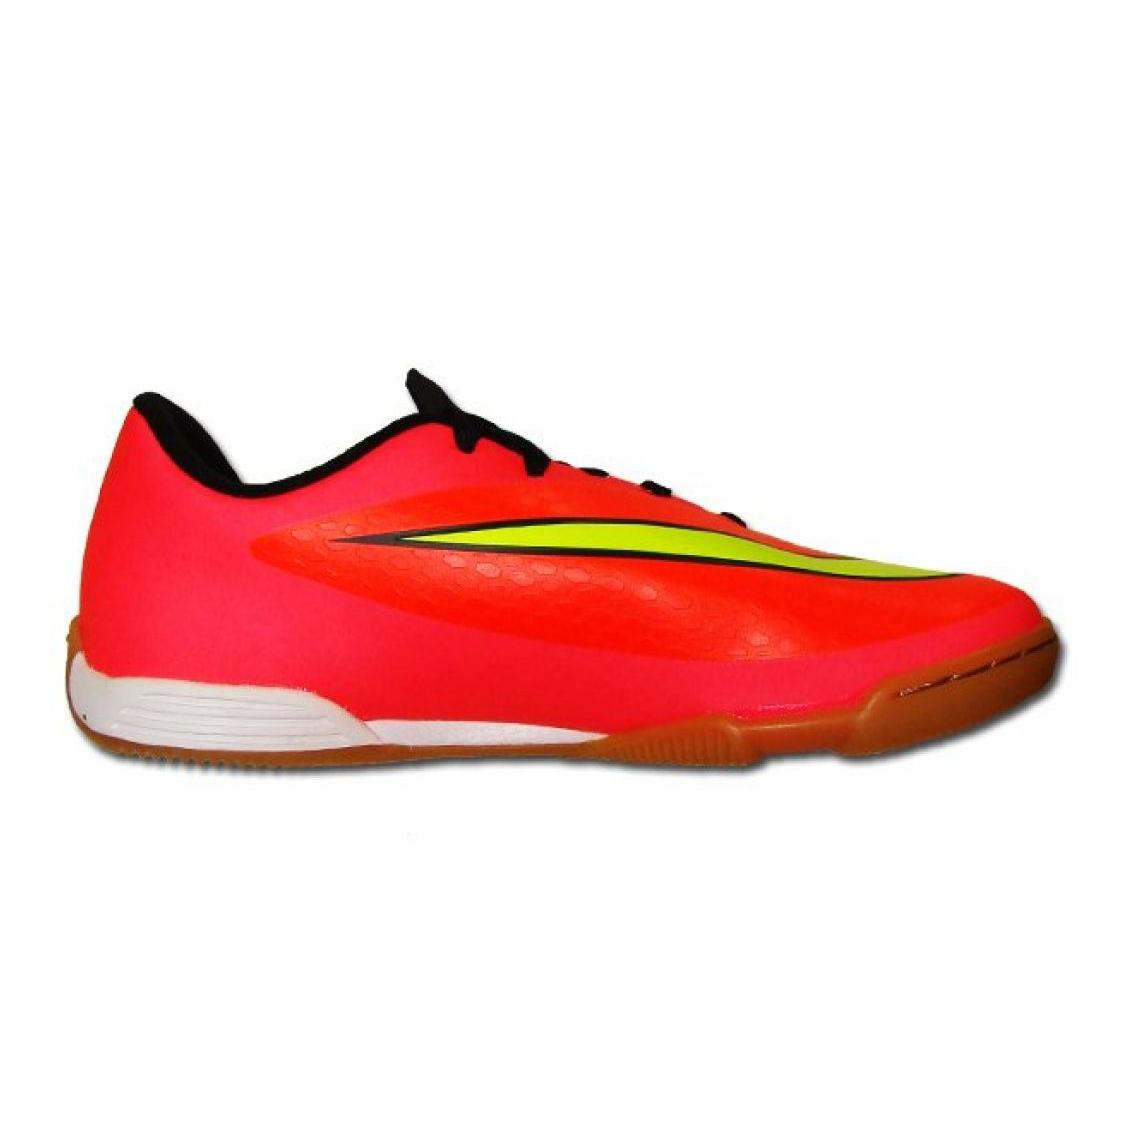 Chaussures Nike Hypervenom Ic 690 Jr Phade 599842 D'intérieur D9eE2YbWHI